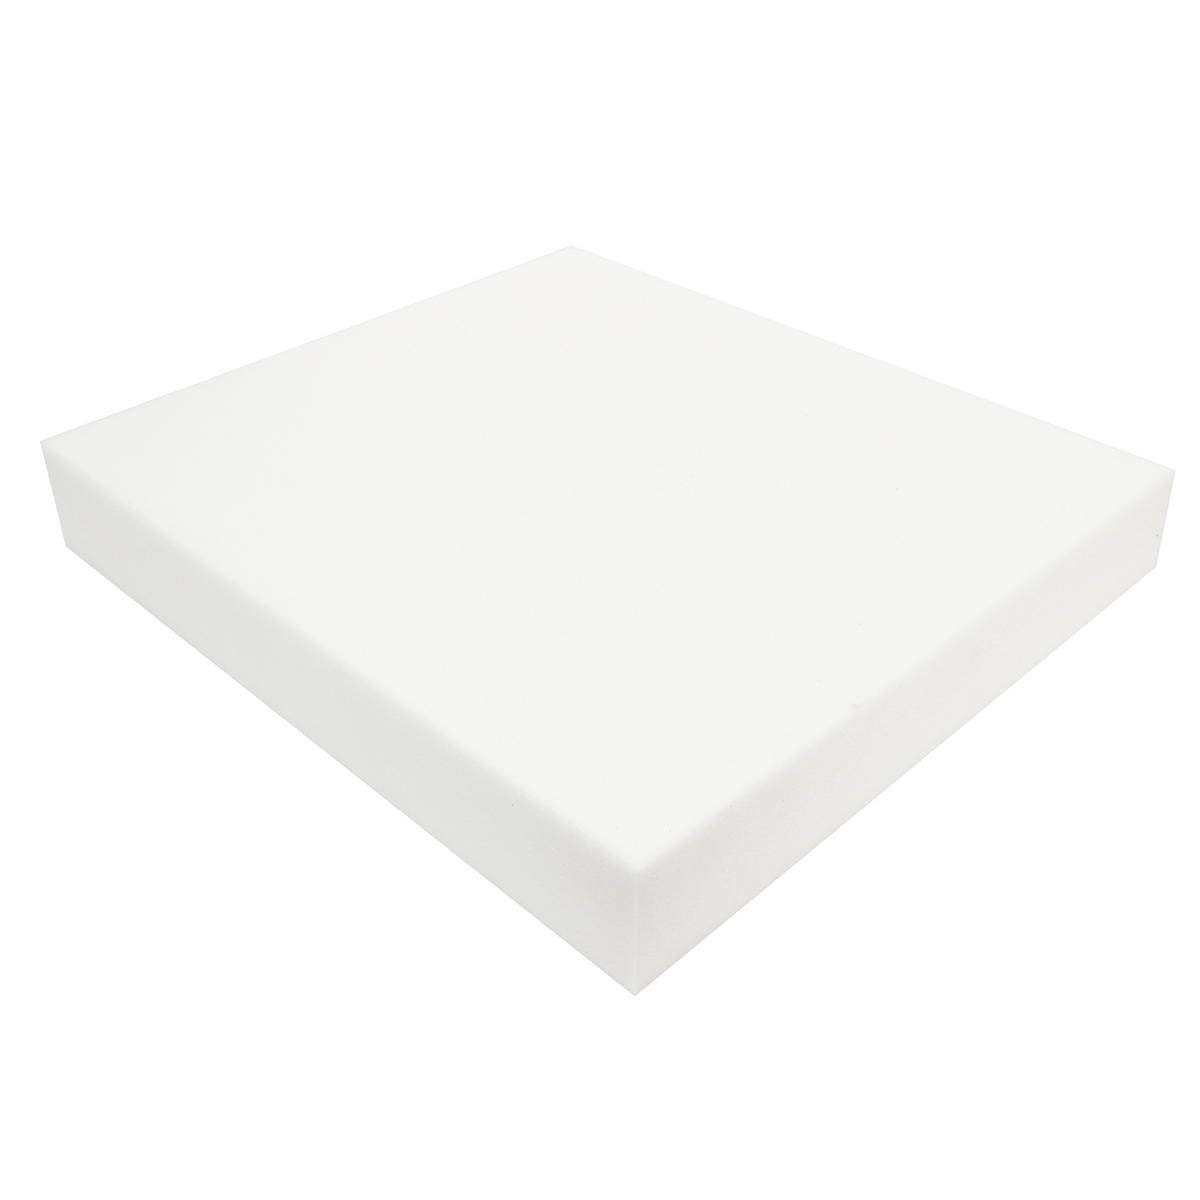 High Density 4T x 24W x 80L 1546 Seat Cushion FIRM Upholstery Sheet Foam Foam Padding Sofa Foam Cushion